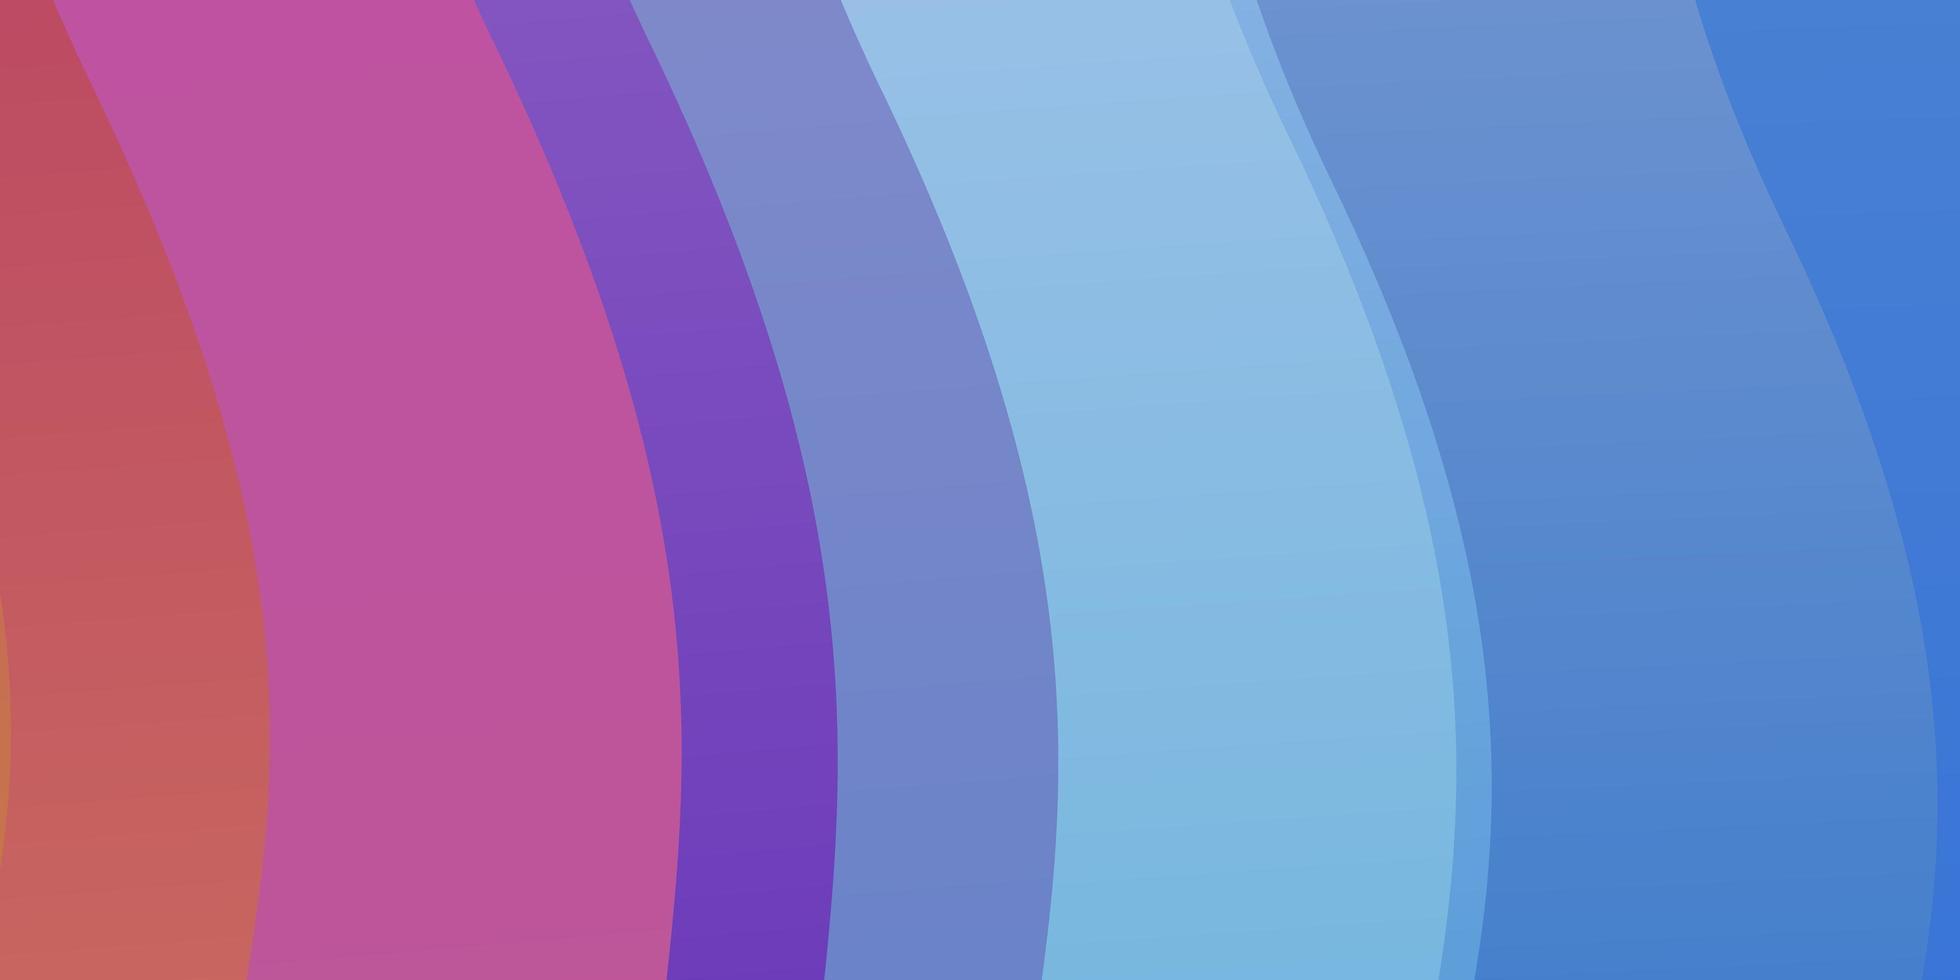 hellblaues, rotes Vektormuster mit schiefen Linien. vektor